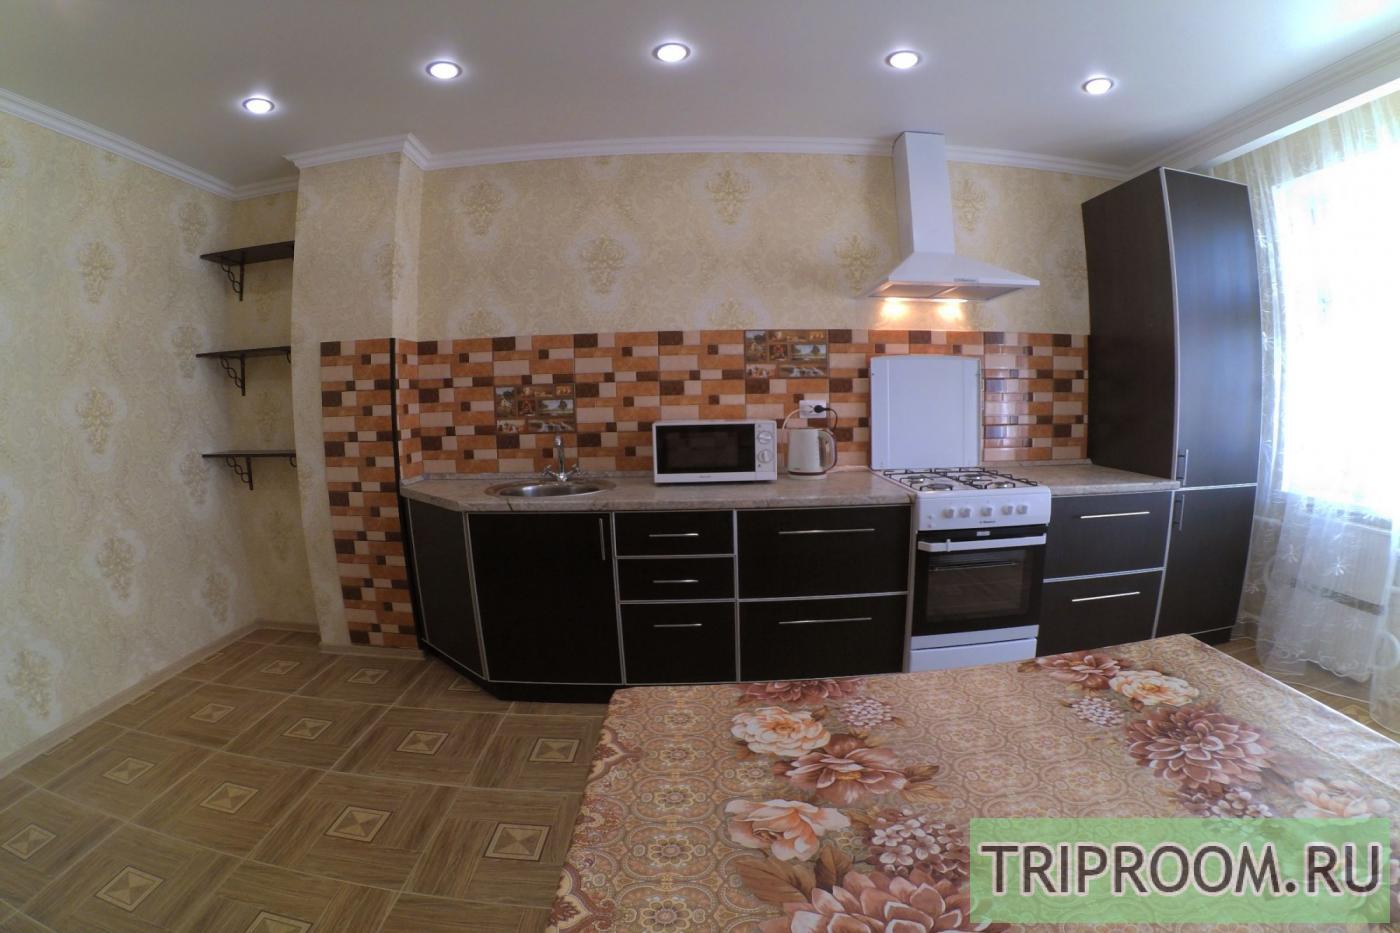 3-комнатная квартира посуточно (вариант № 20683), ул. Рашида Вагапова, фото № 3